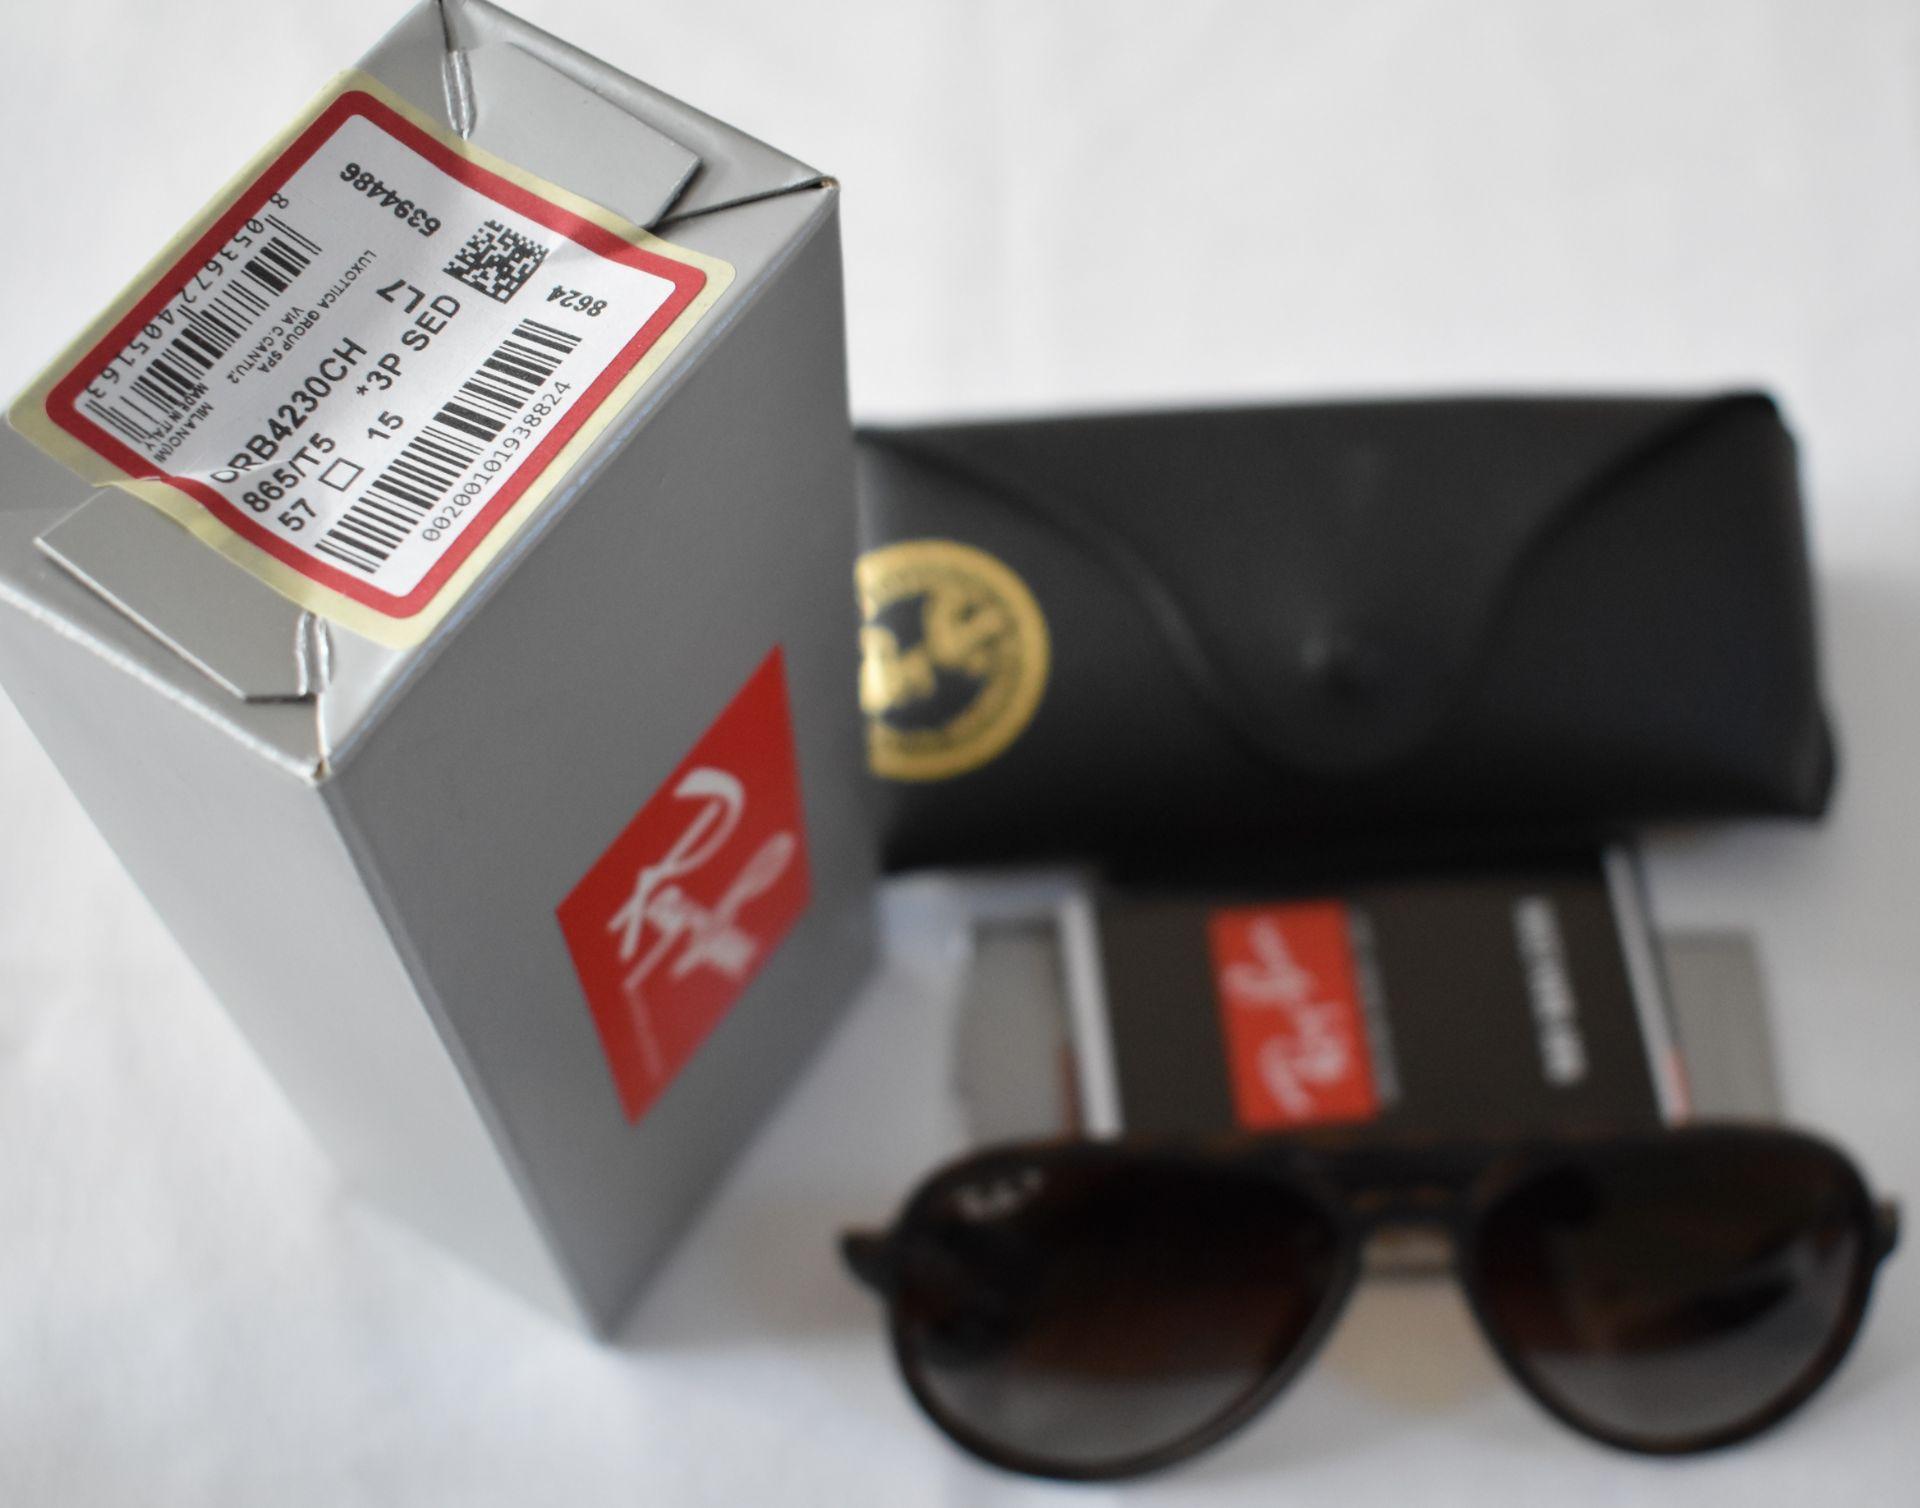 Ray Ban Sunglasses (Ferrari) ORB4320CH 865/T5 *3P - Image 3 of 3